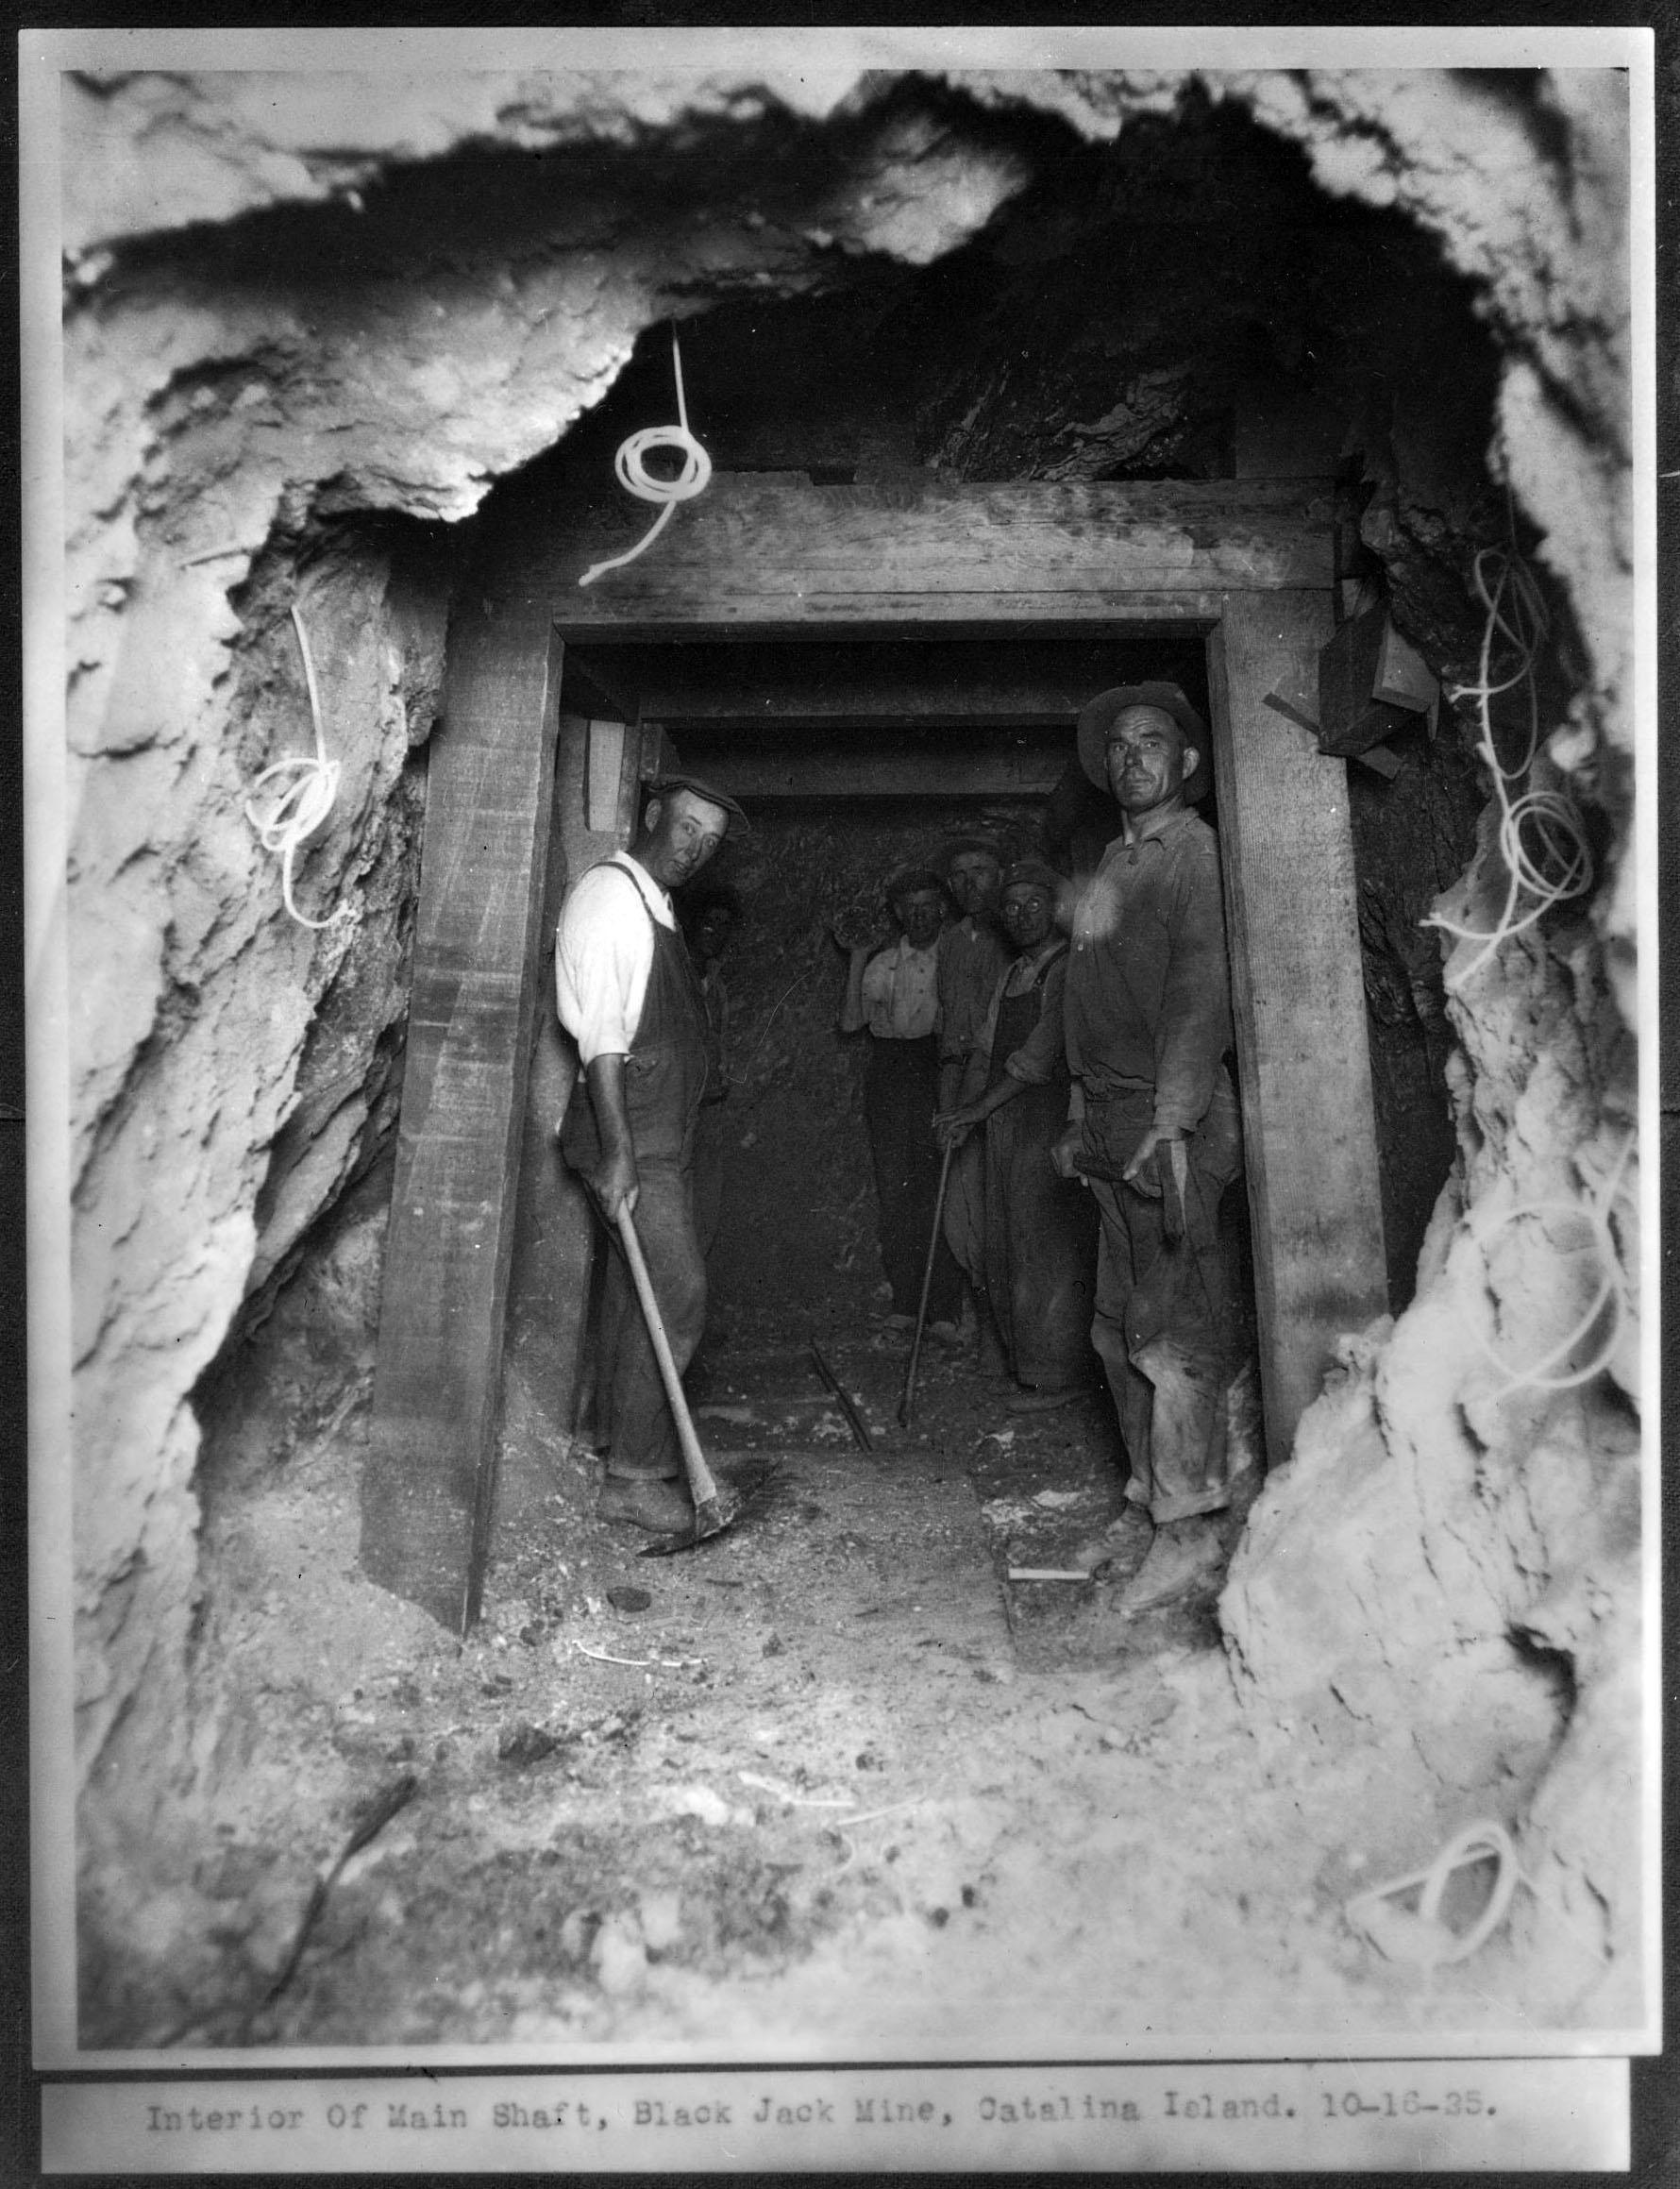 Black Jack Mine, Catalina Island